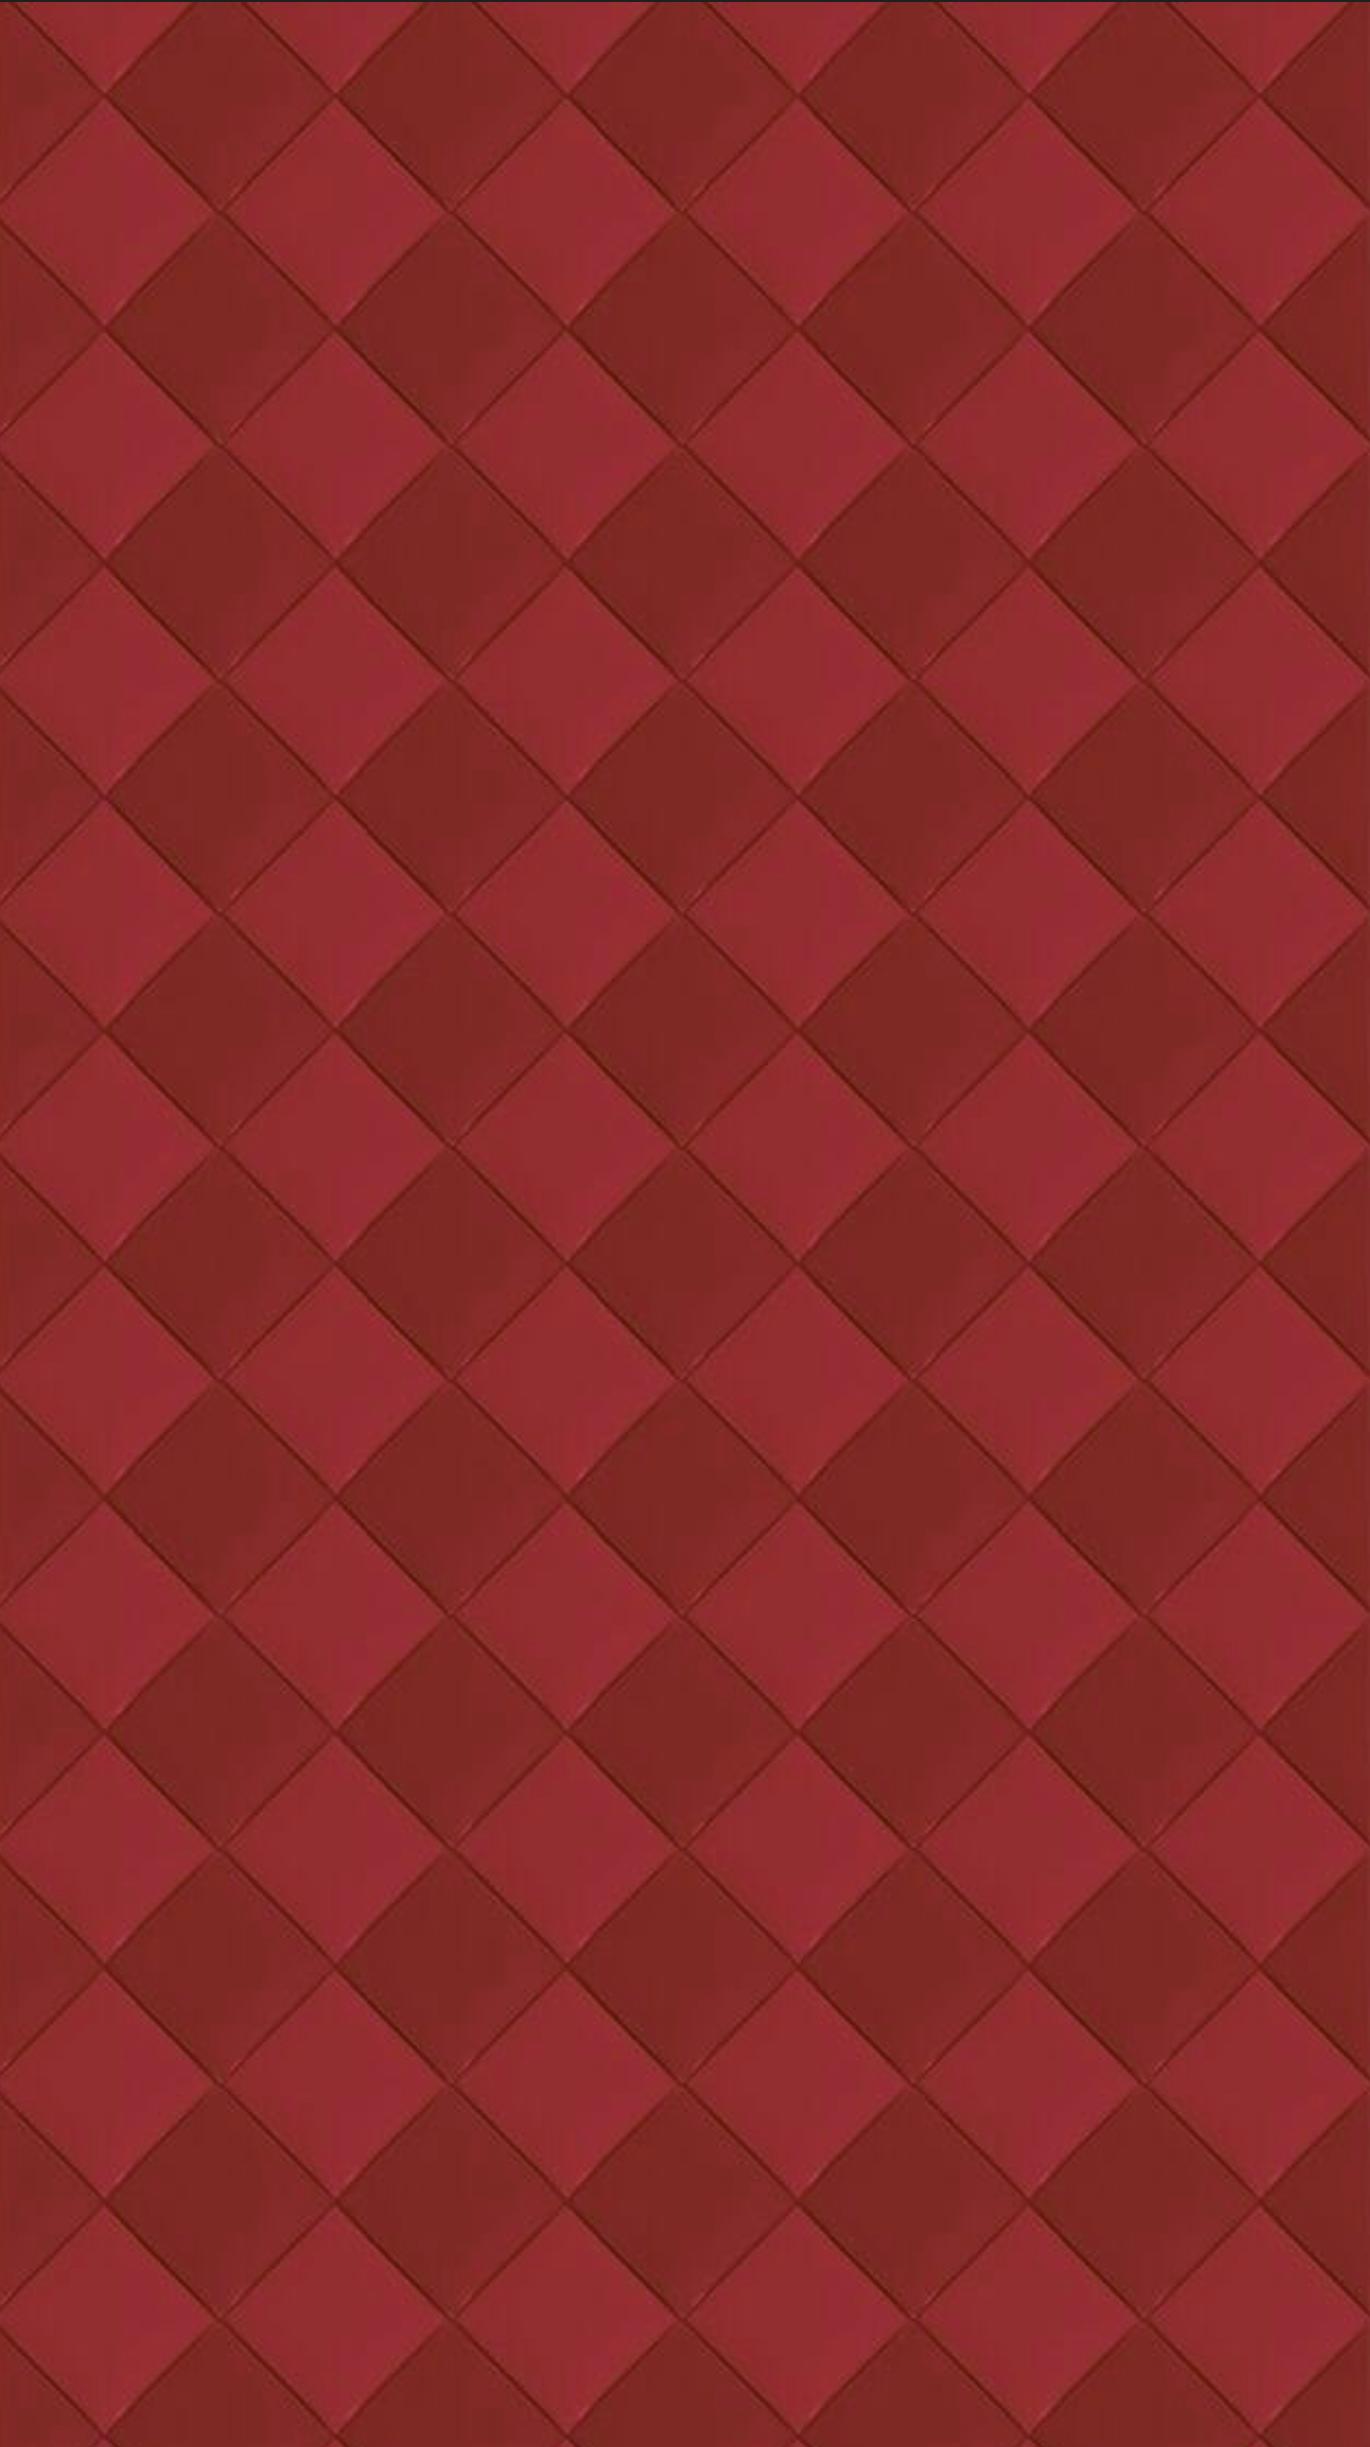 Red clear clashroyale background ClashRoyale 1370x2447